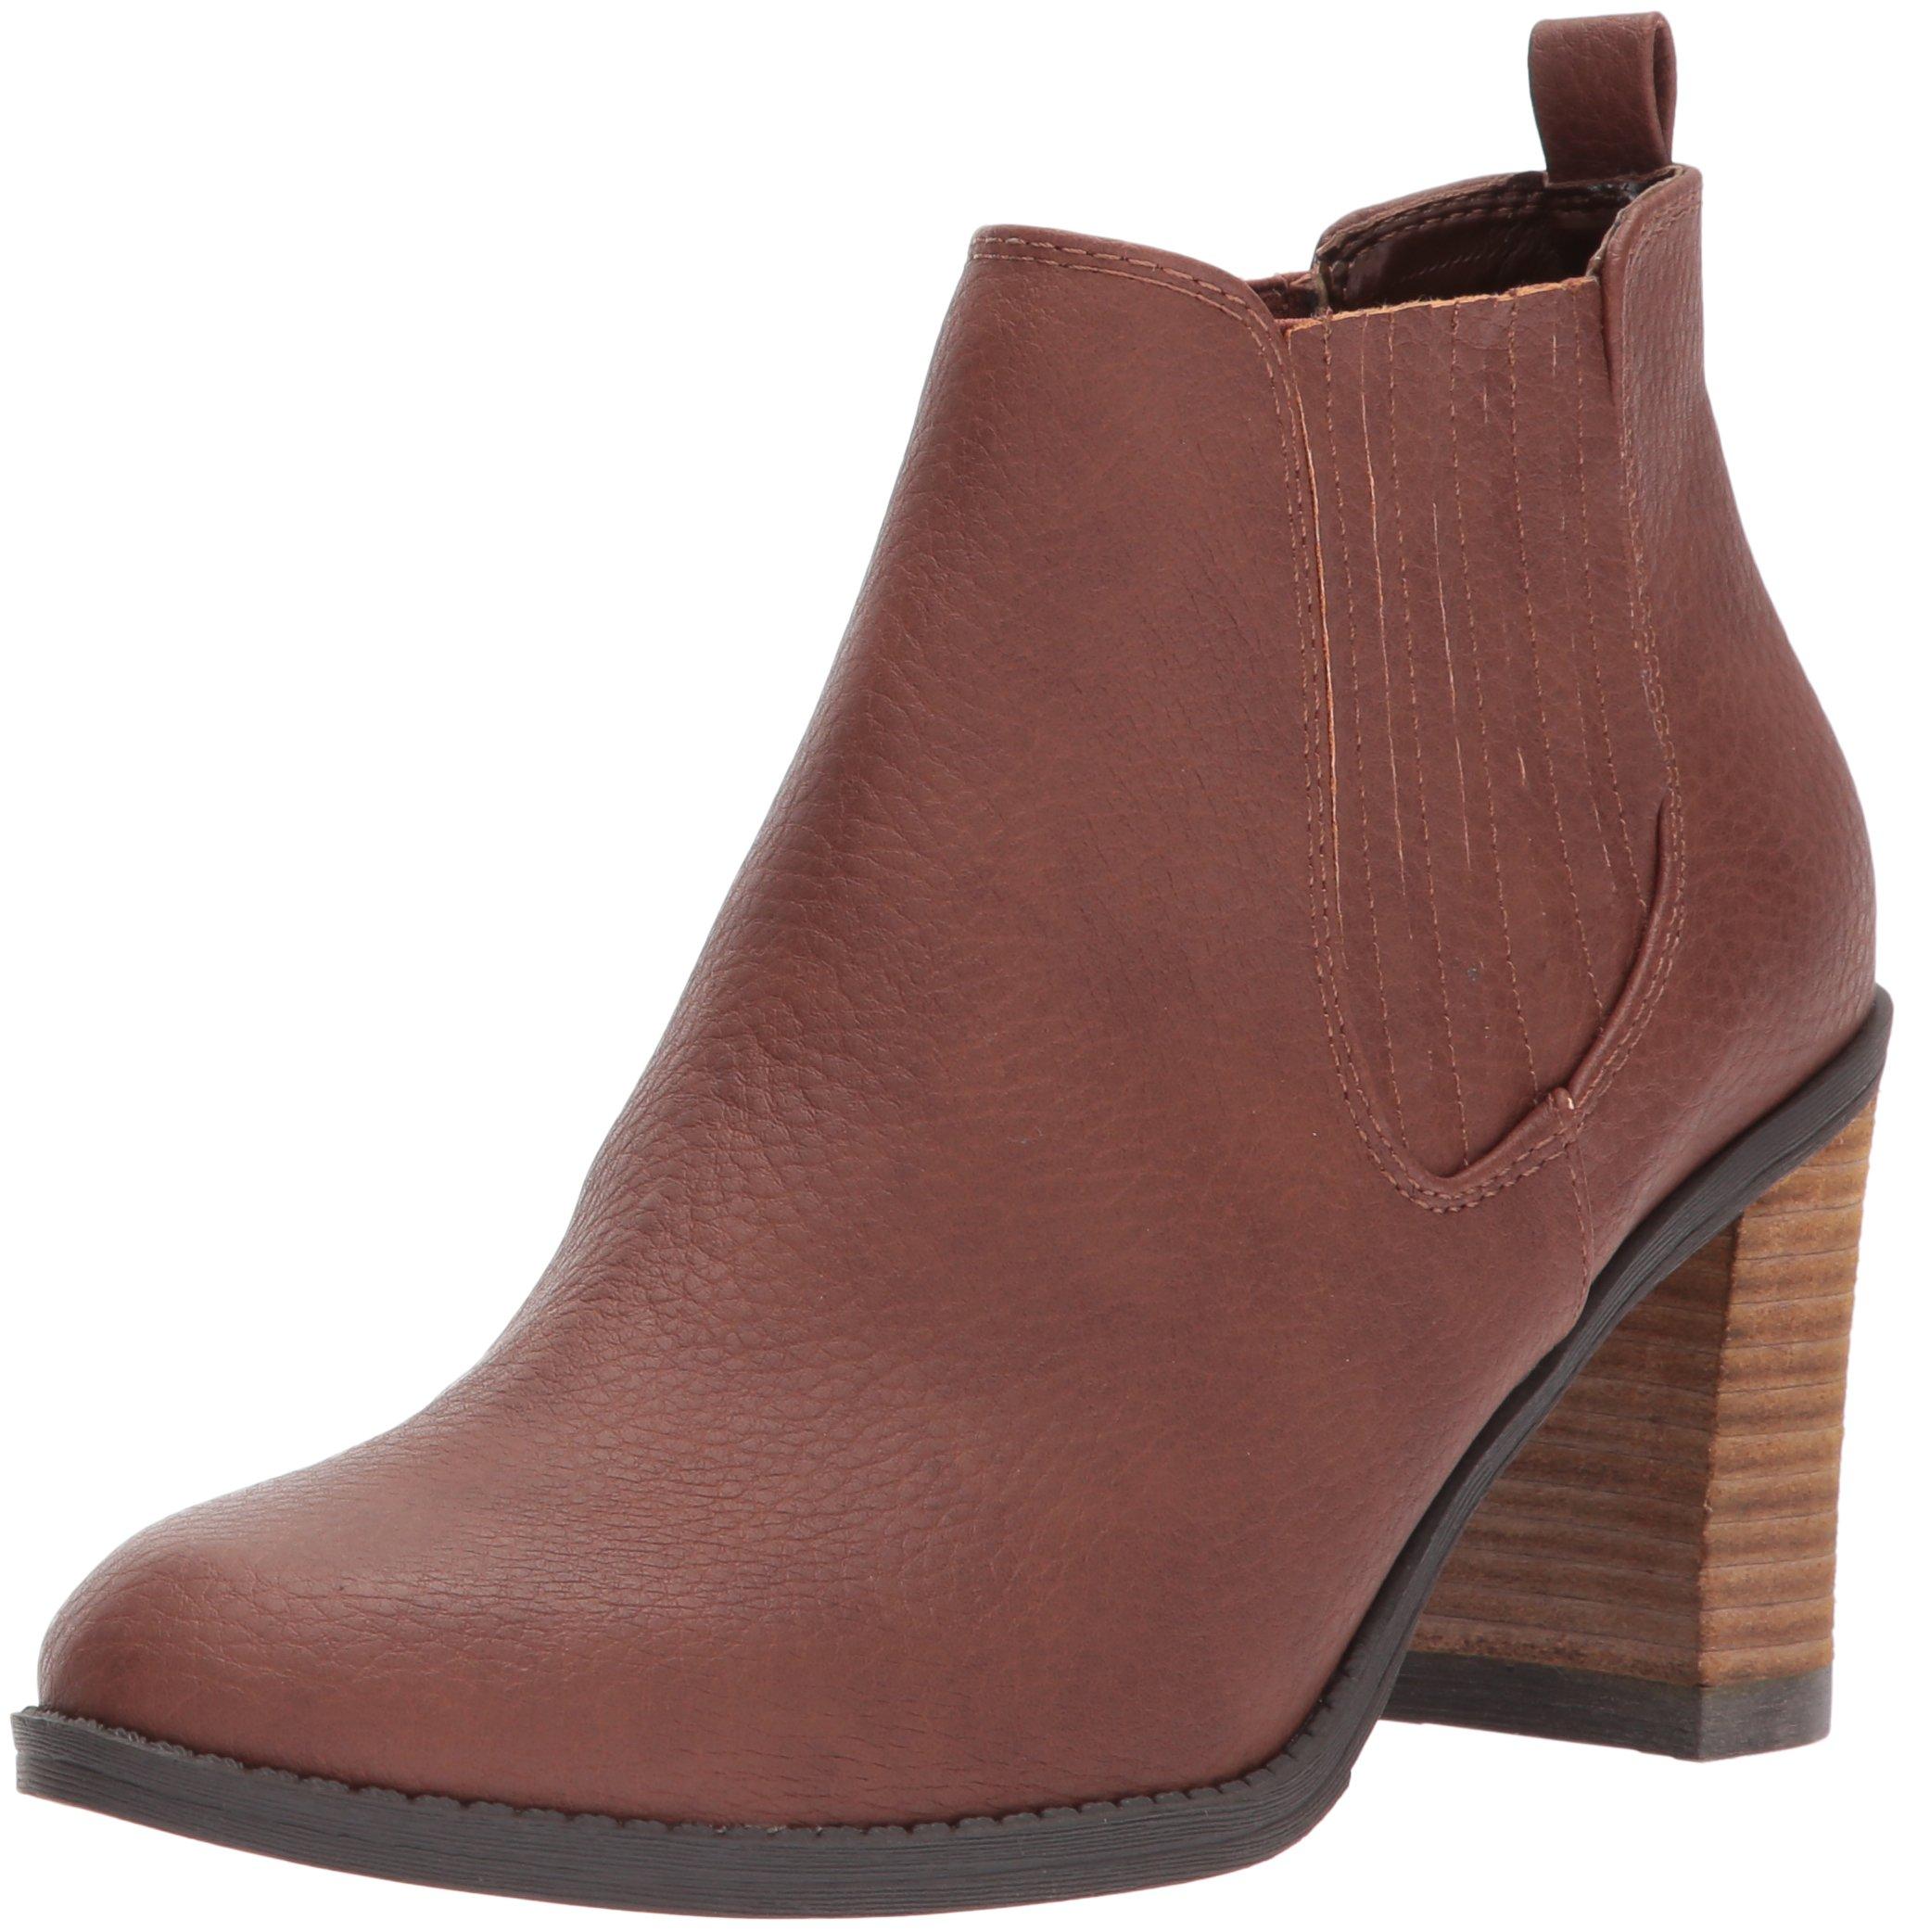 Dr. Scholl's Shoes Women's Launch Boot, Copper Brown, 6 M US